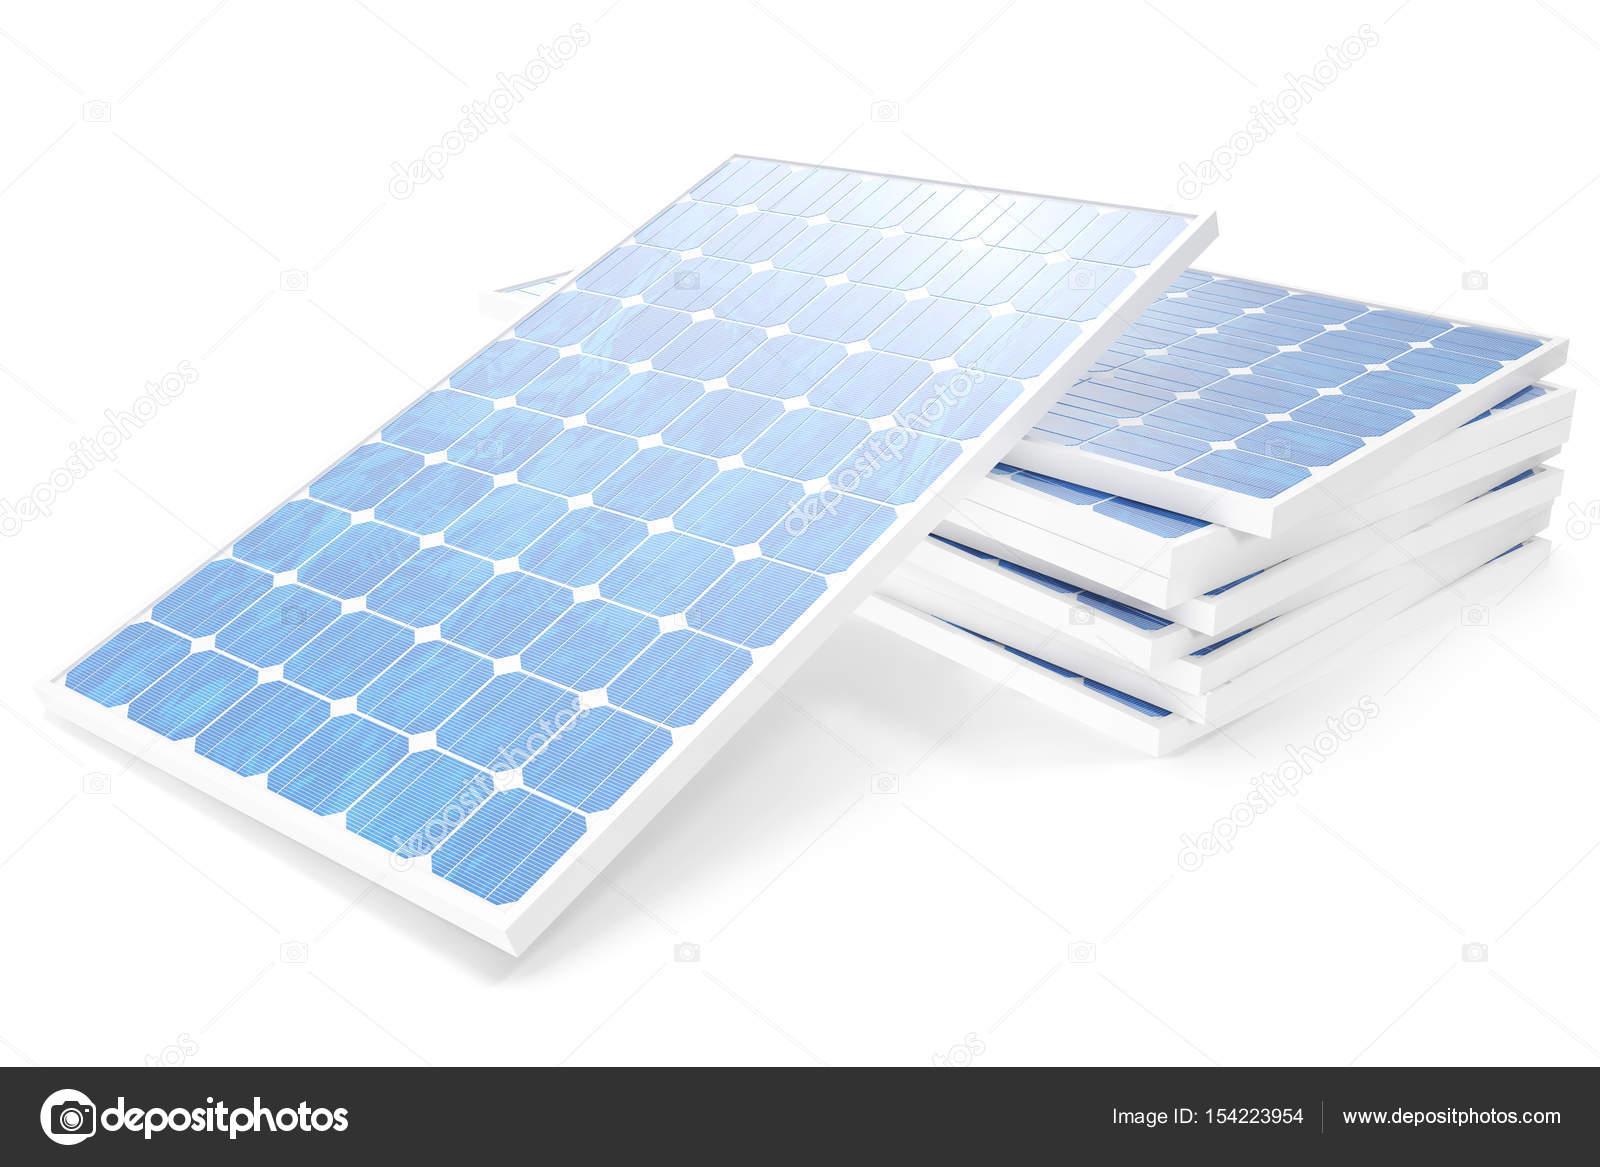 3 D イラスト太陽光発電技術ブルーのソーラー パネルコンセプト代替